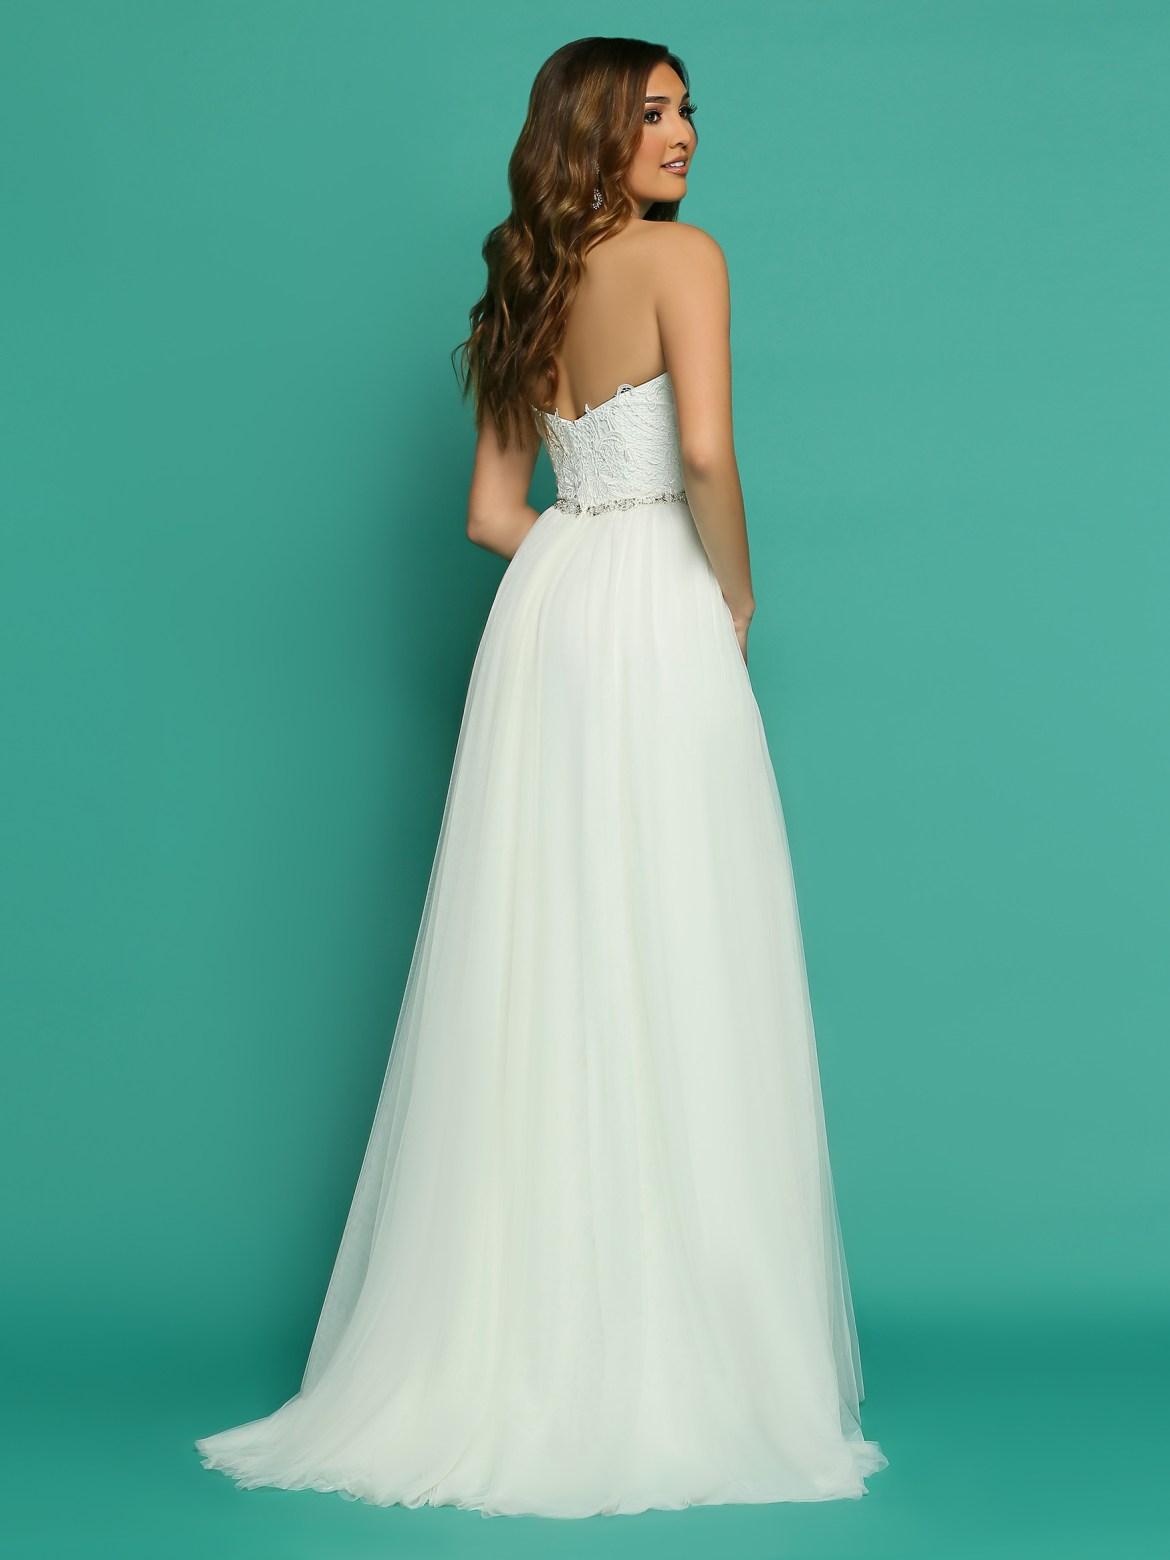 Informal Destination Wedding Dresses: Ball Gowns, Detachable Trains ...